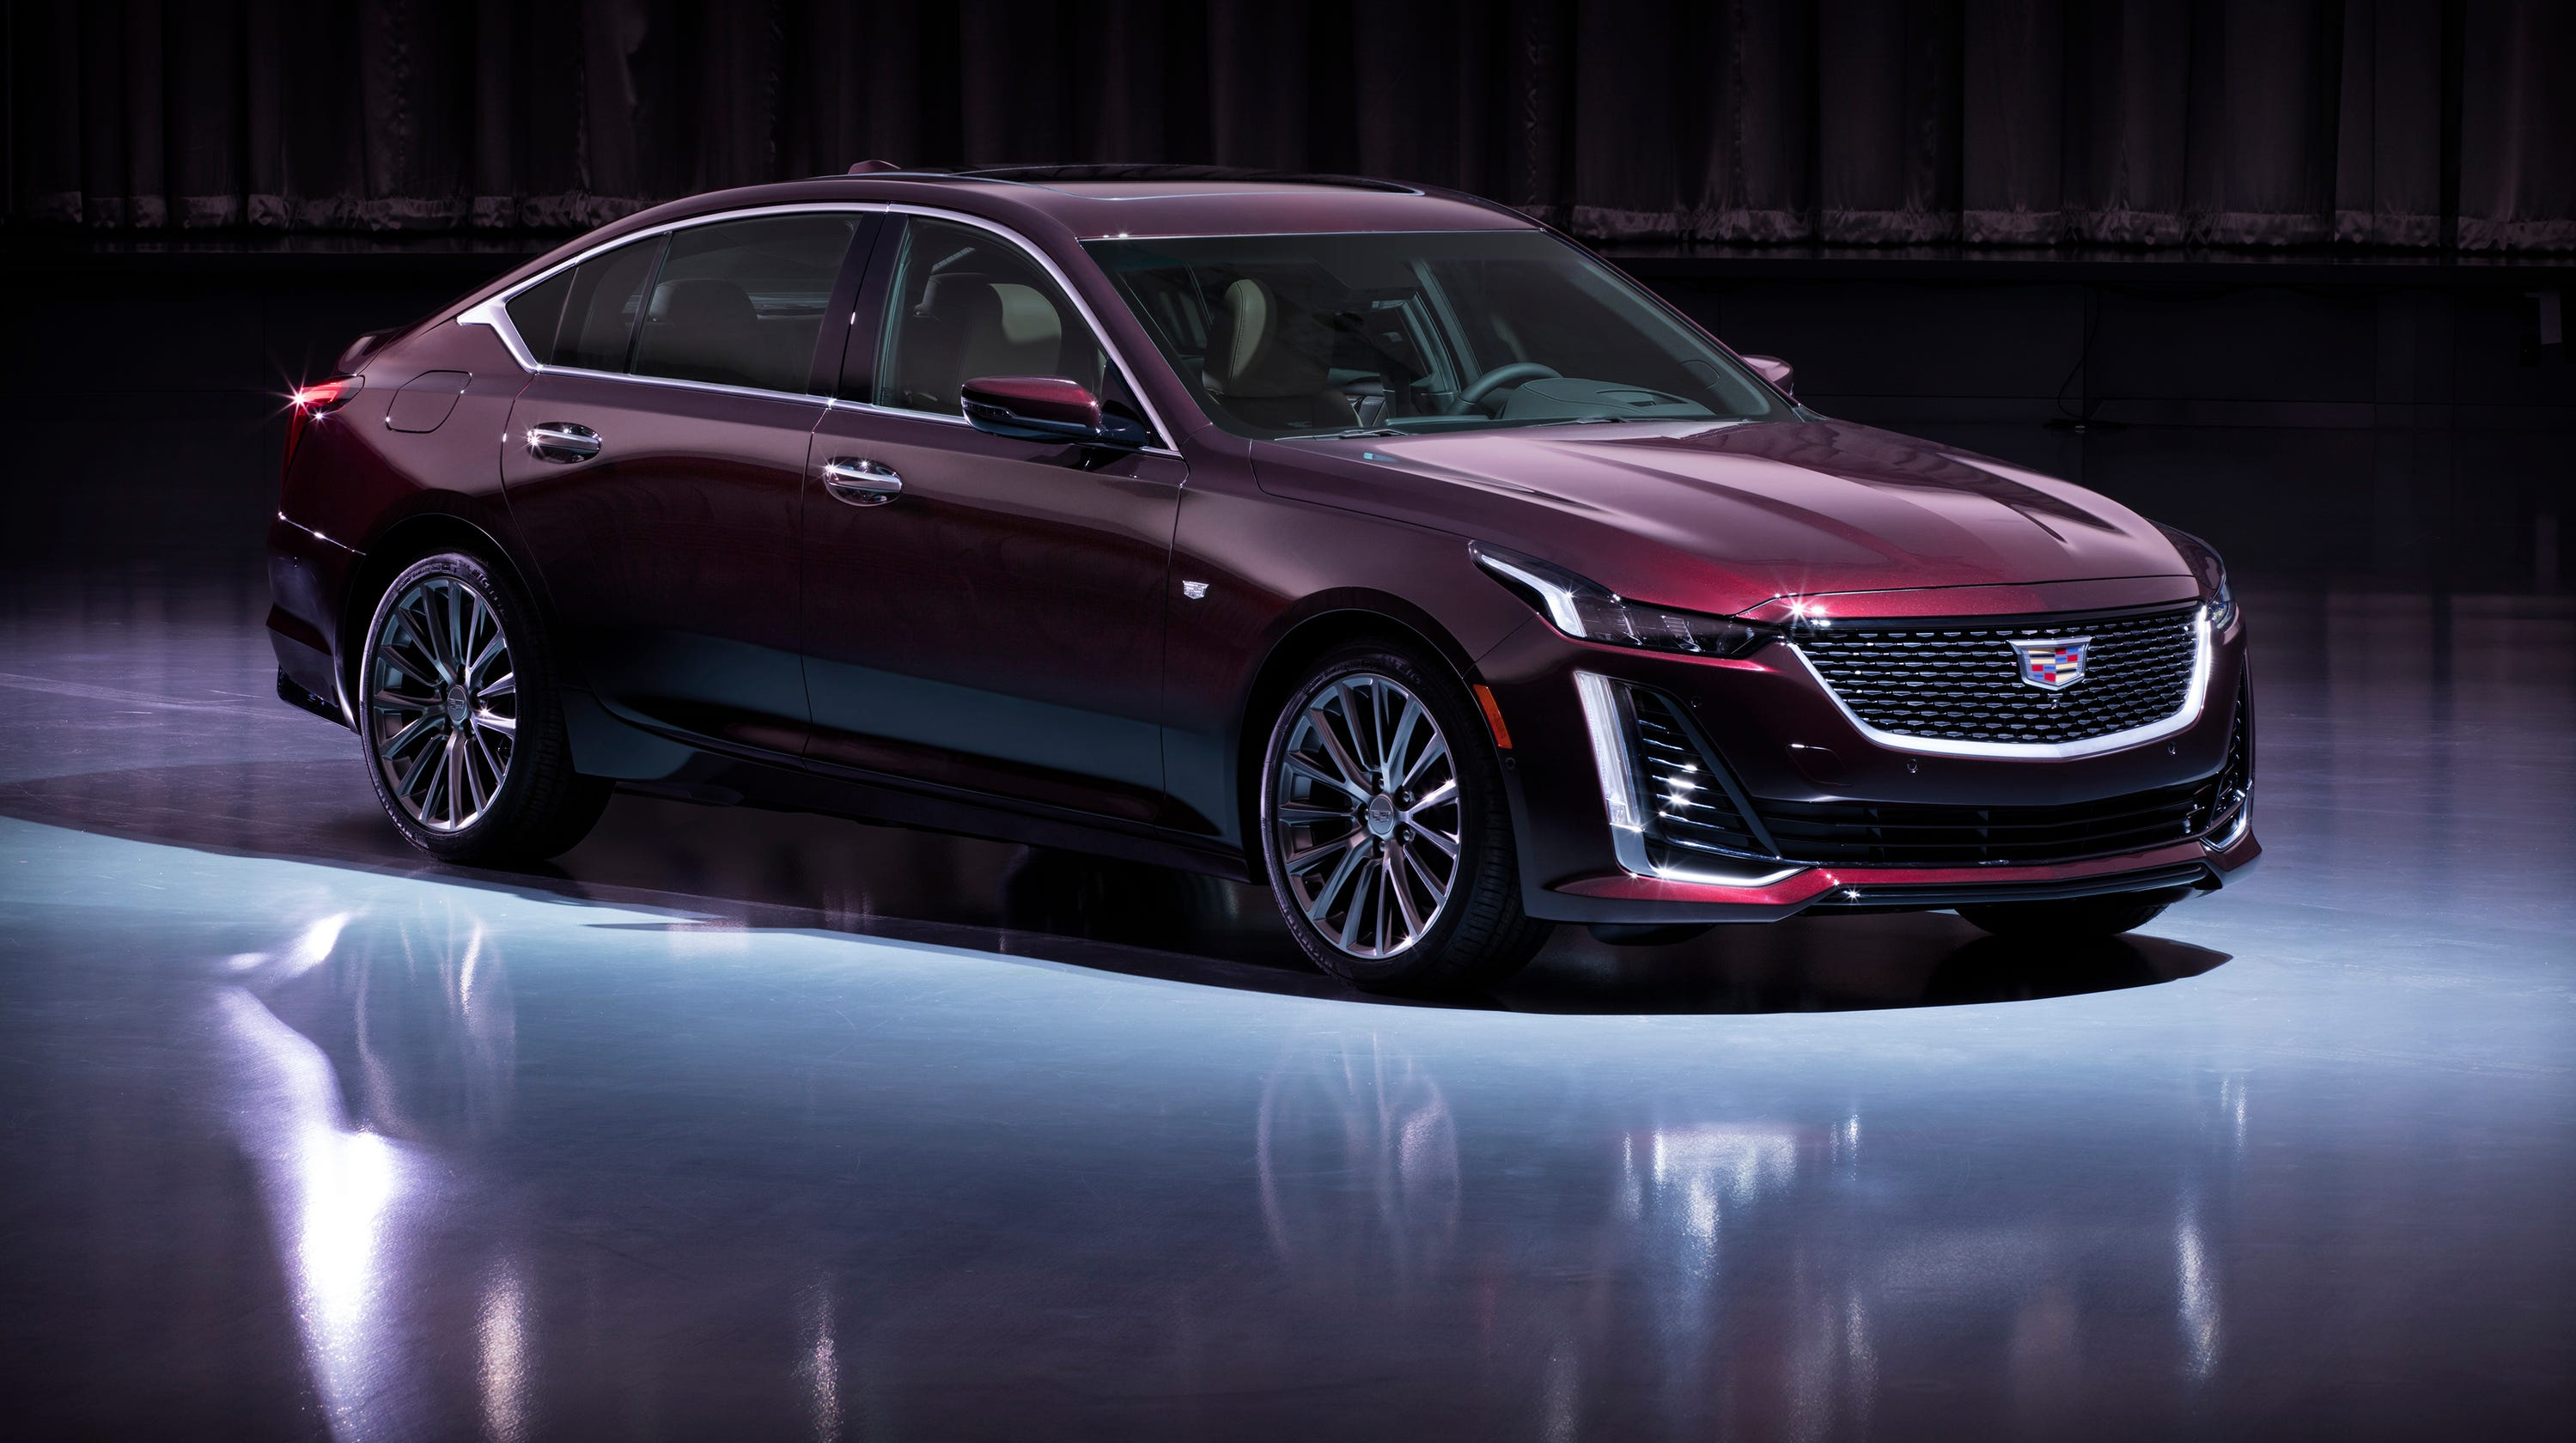 2020 Cadillac Ct5 Luxury Sedan Priced Far Below Cts Predecessor